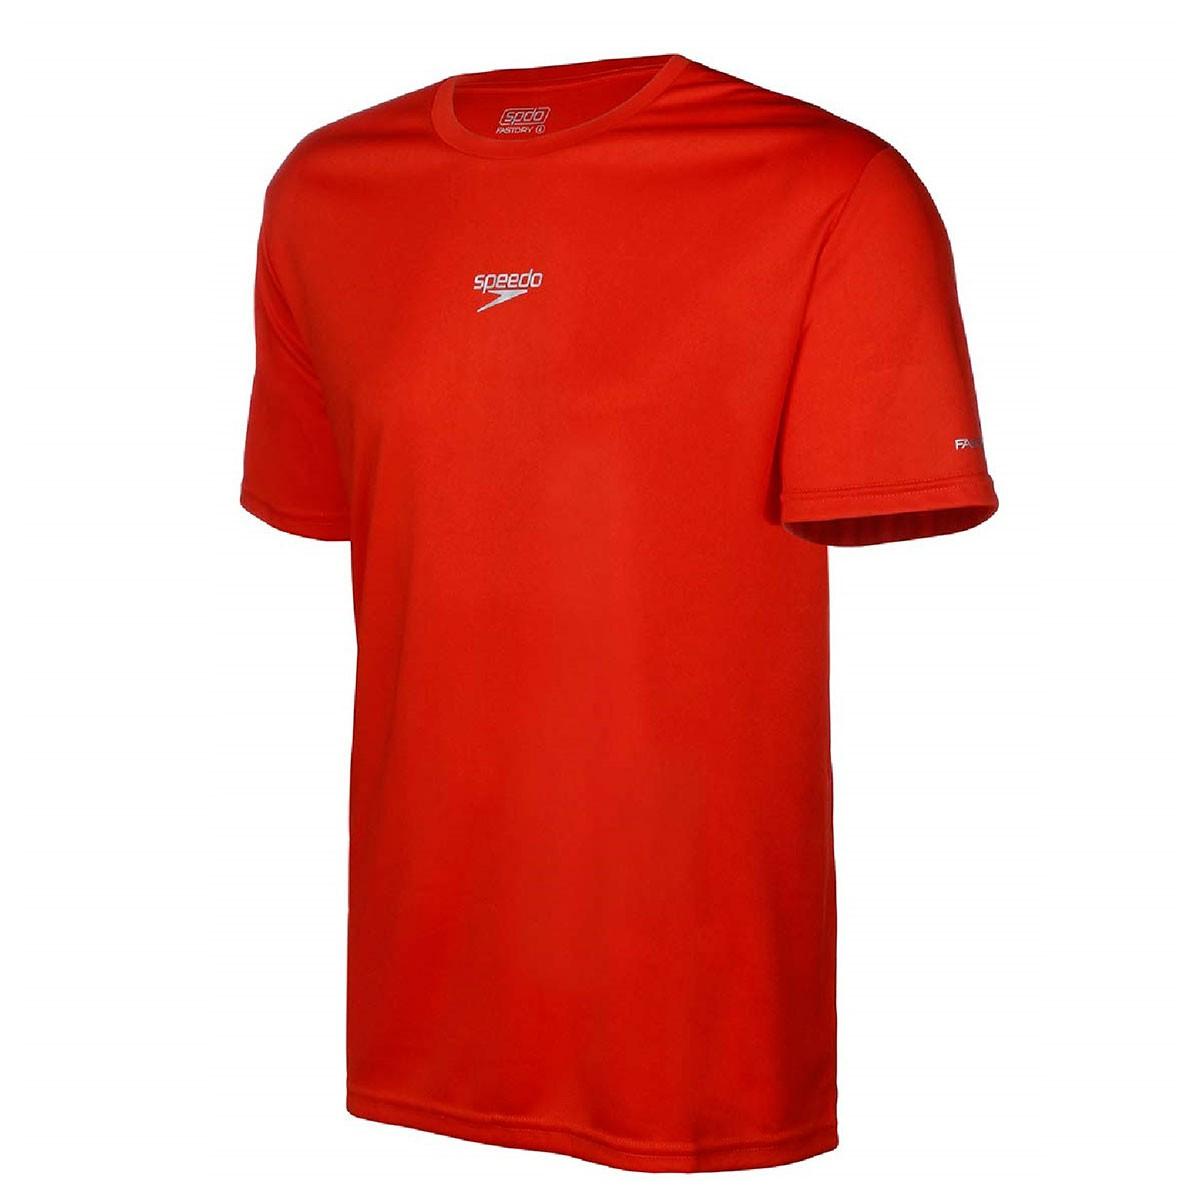 Camiseta Speedo Interlock Canoa Vermelho Feminino